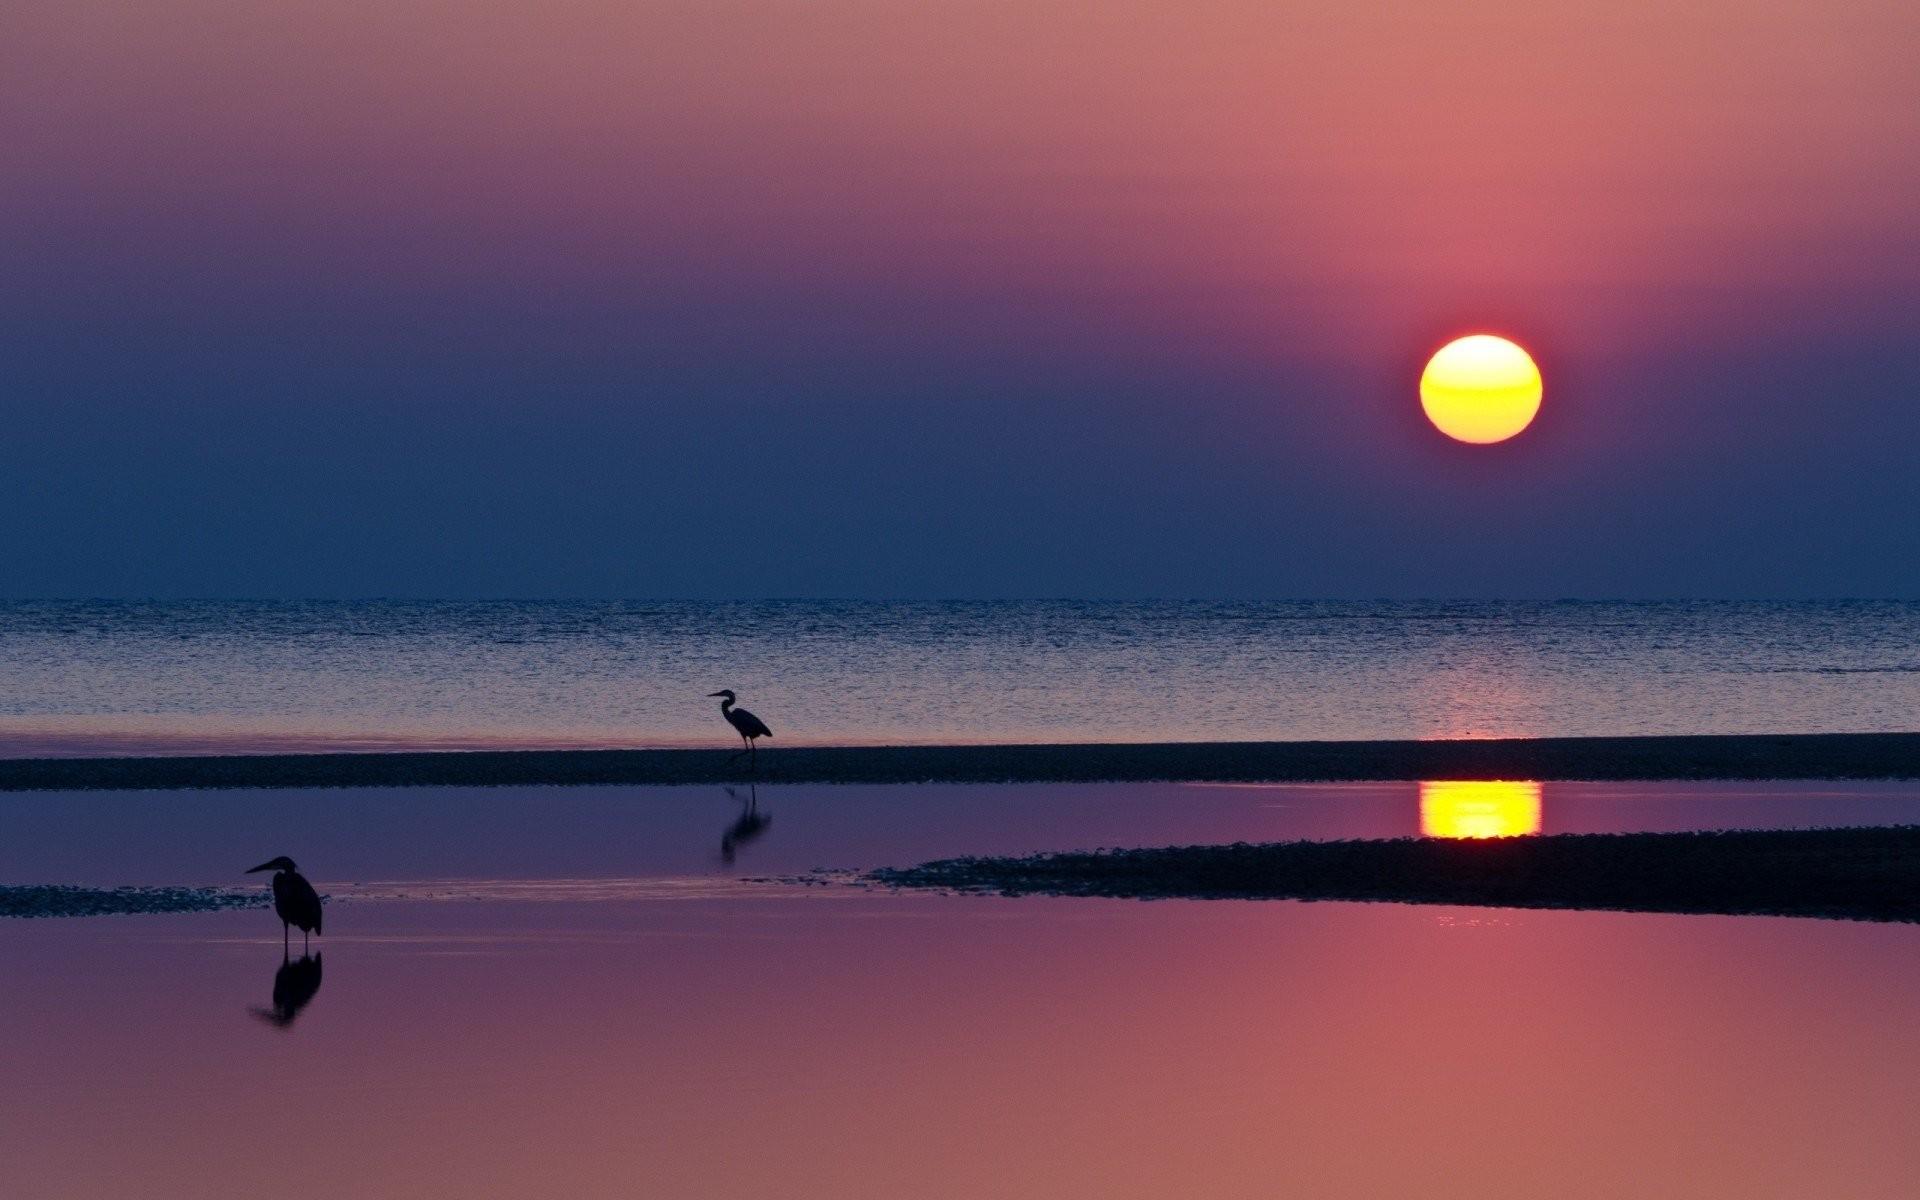 night beach sunset reflection water sun sea silhouettes heron horizon